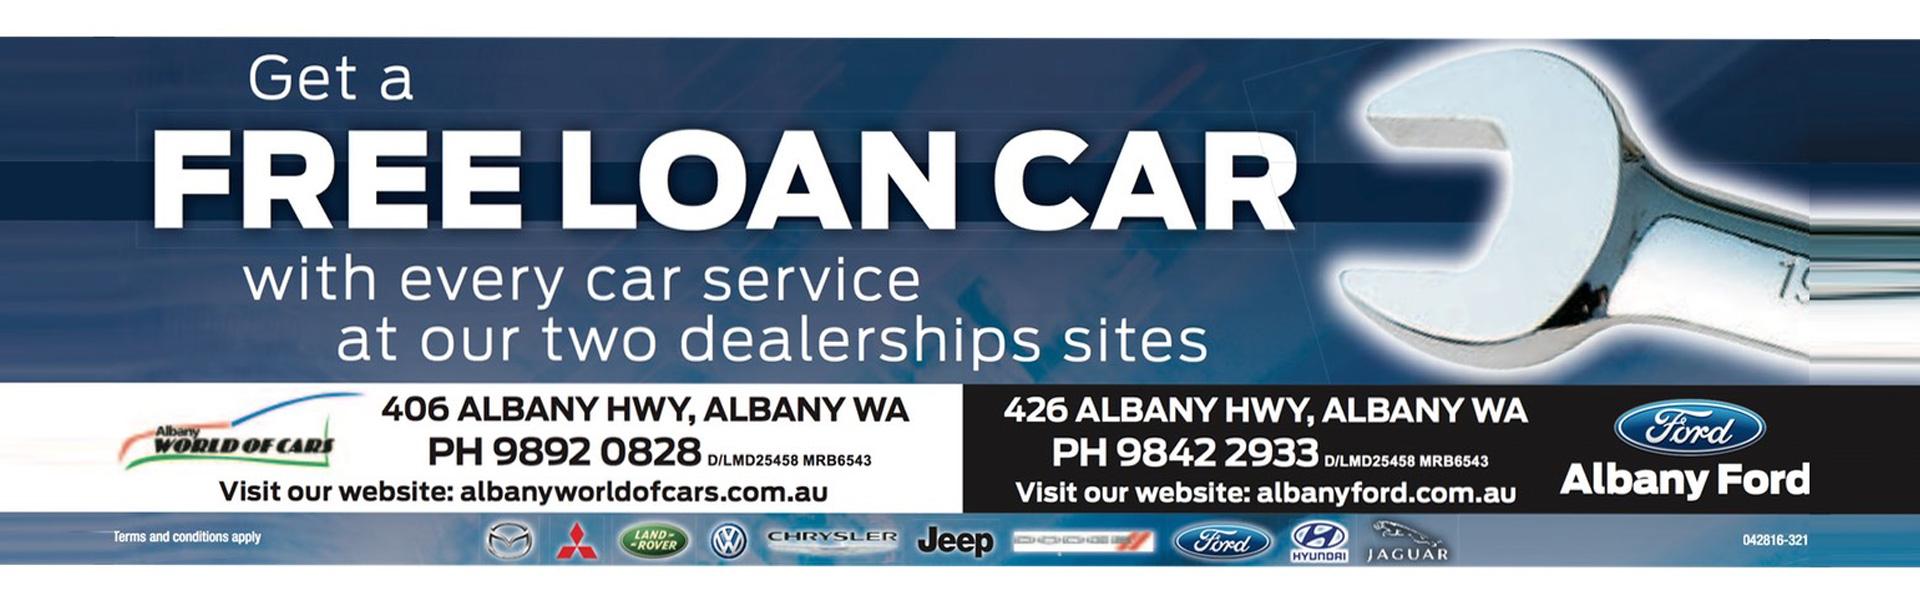 New Ford Vehicles  sc 1 th 125 & Ford Dealer Albany - Albany Ford markmcfarlin.com